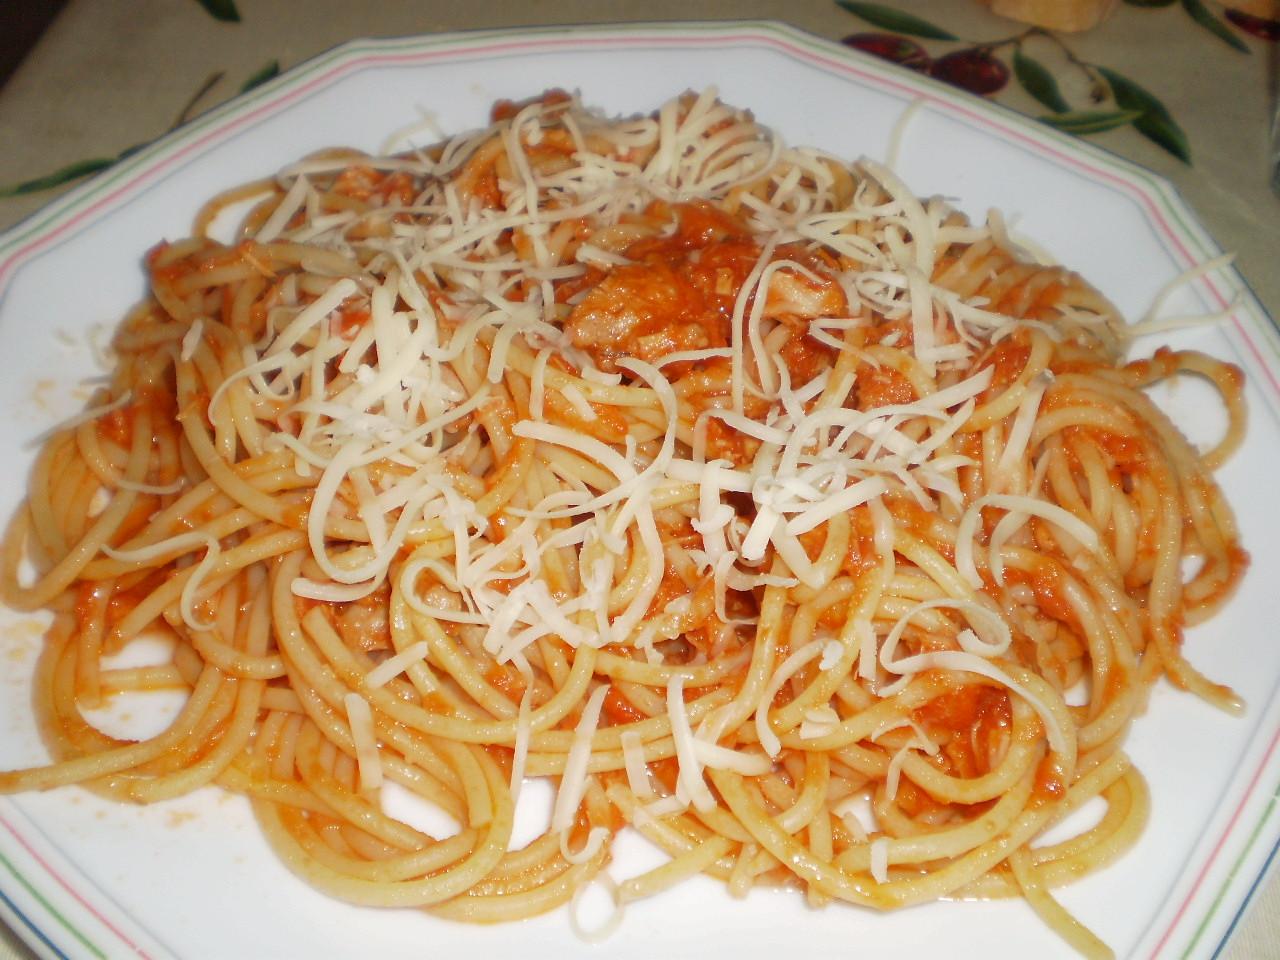 Cocina sin tonterias espaguetis con tomate y at n for Plato de espaguetis